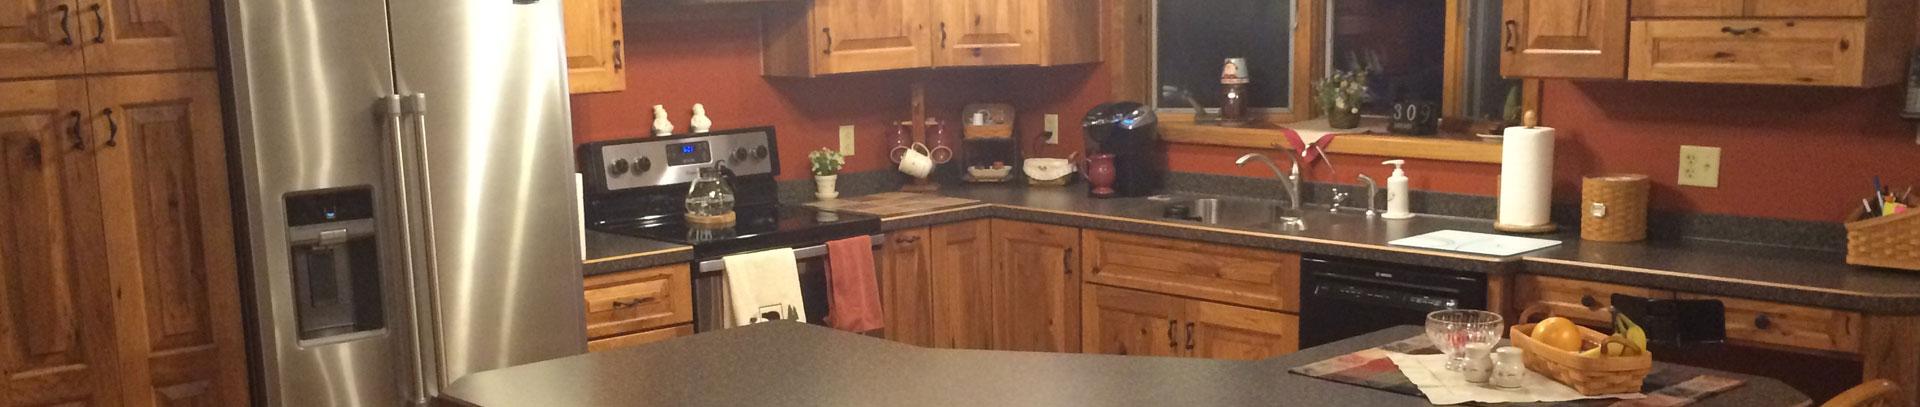 Country-Kitchen-banner